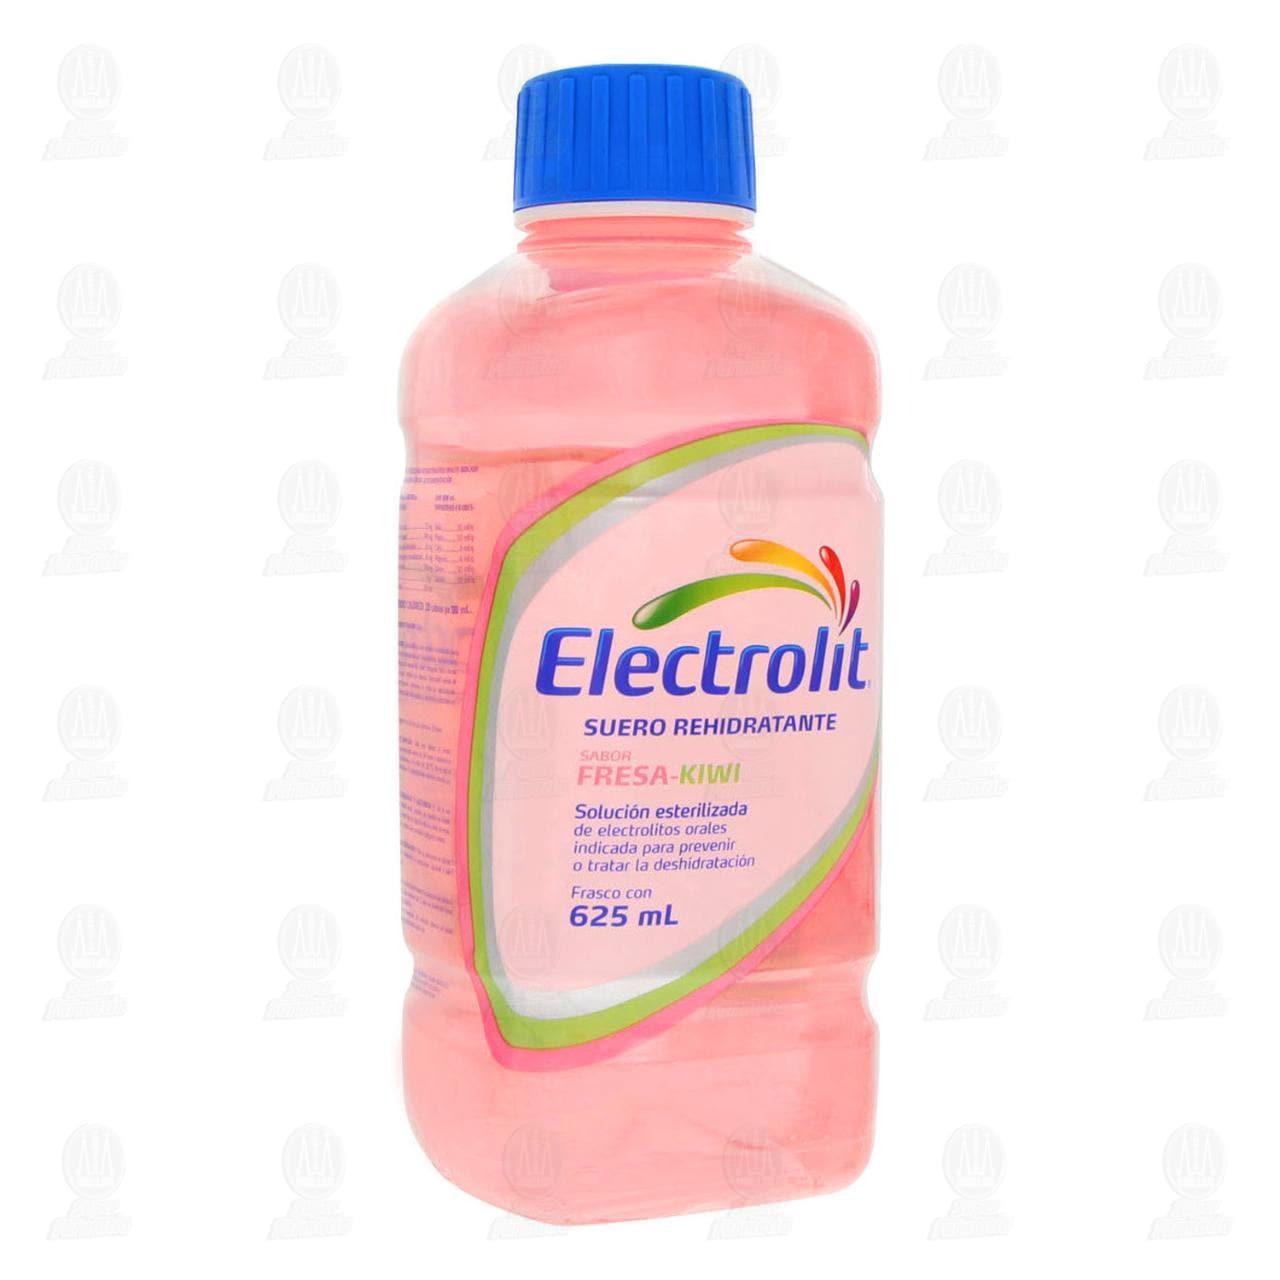 Electrolit Fresa Kiwi 625 ml. Adulto Plástico